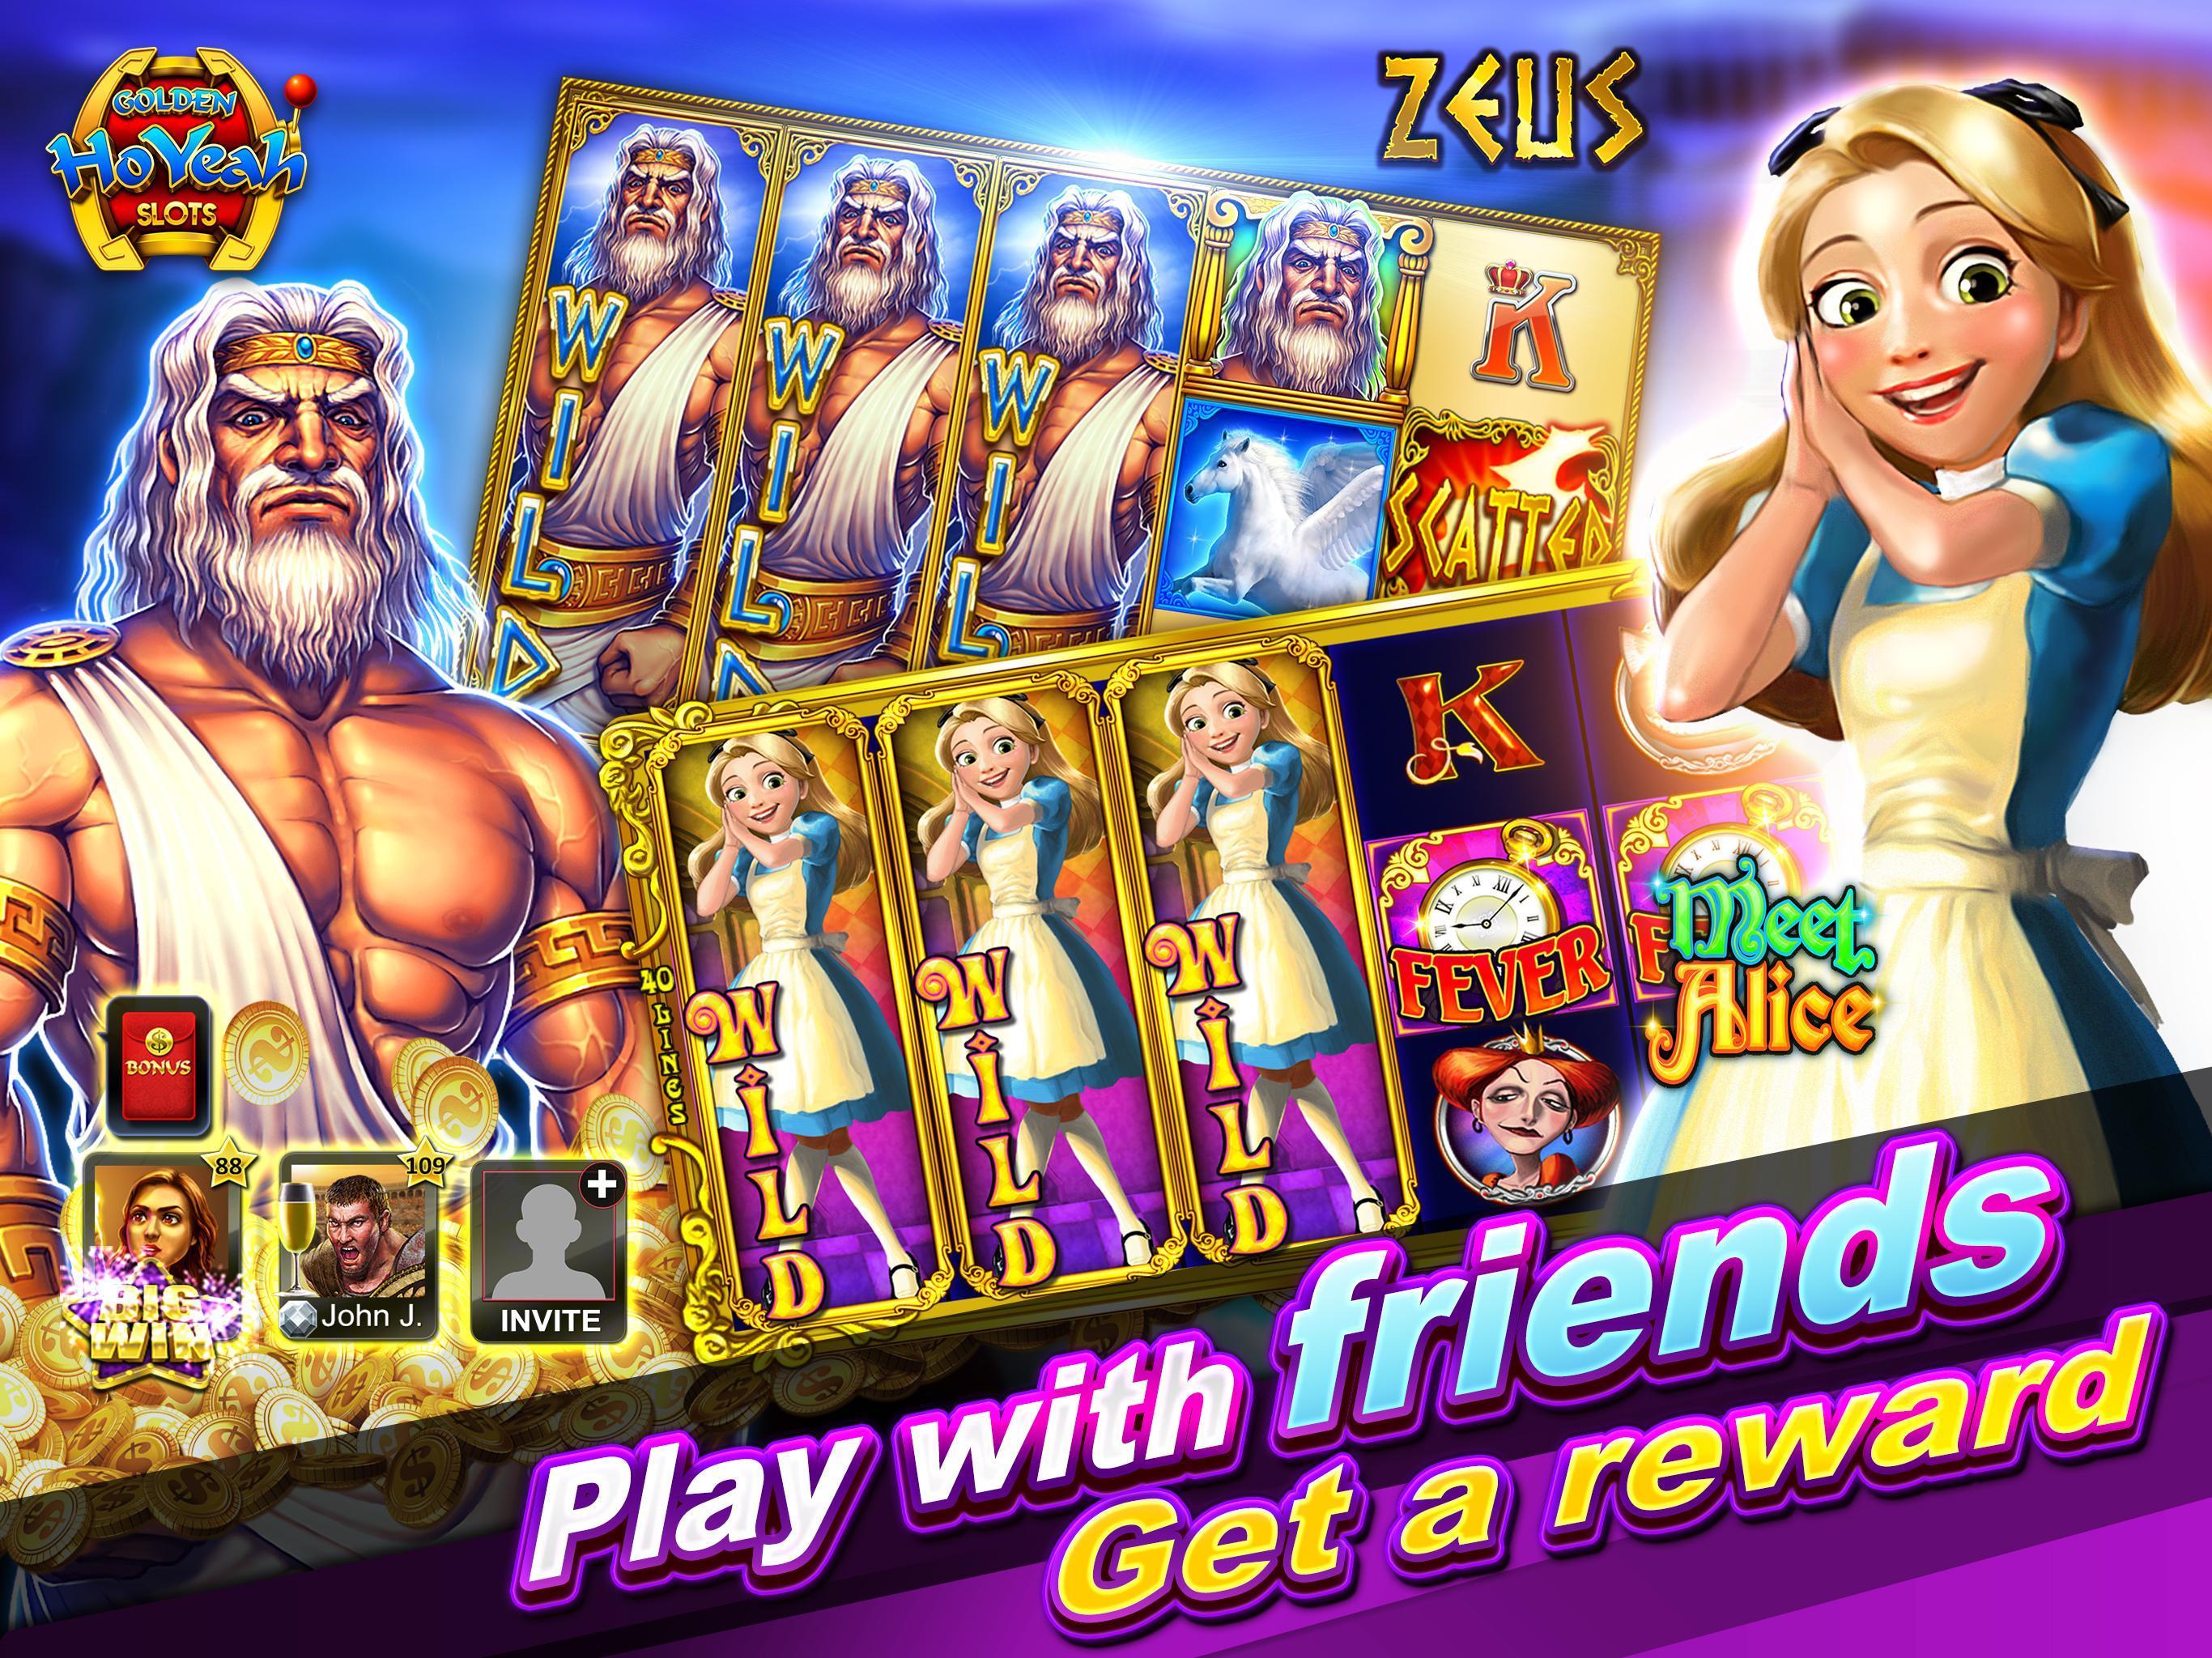 Slots (Golden HoYeah) - Casino Slots 2.5.7 Screenshot 7